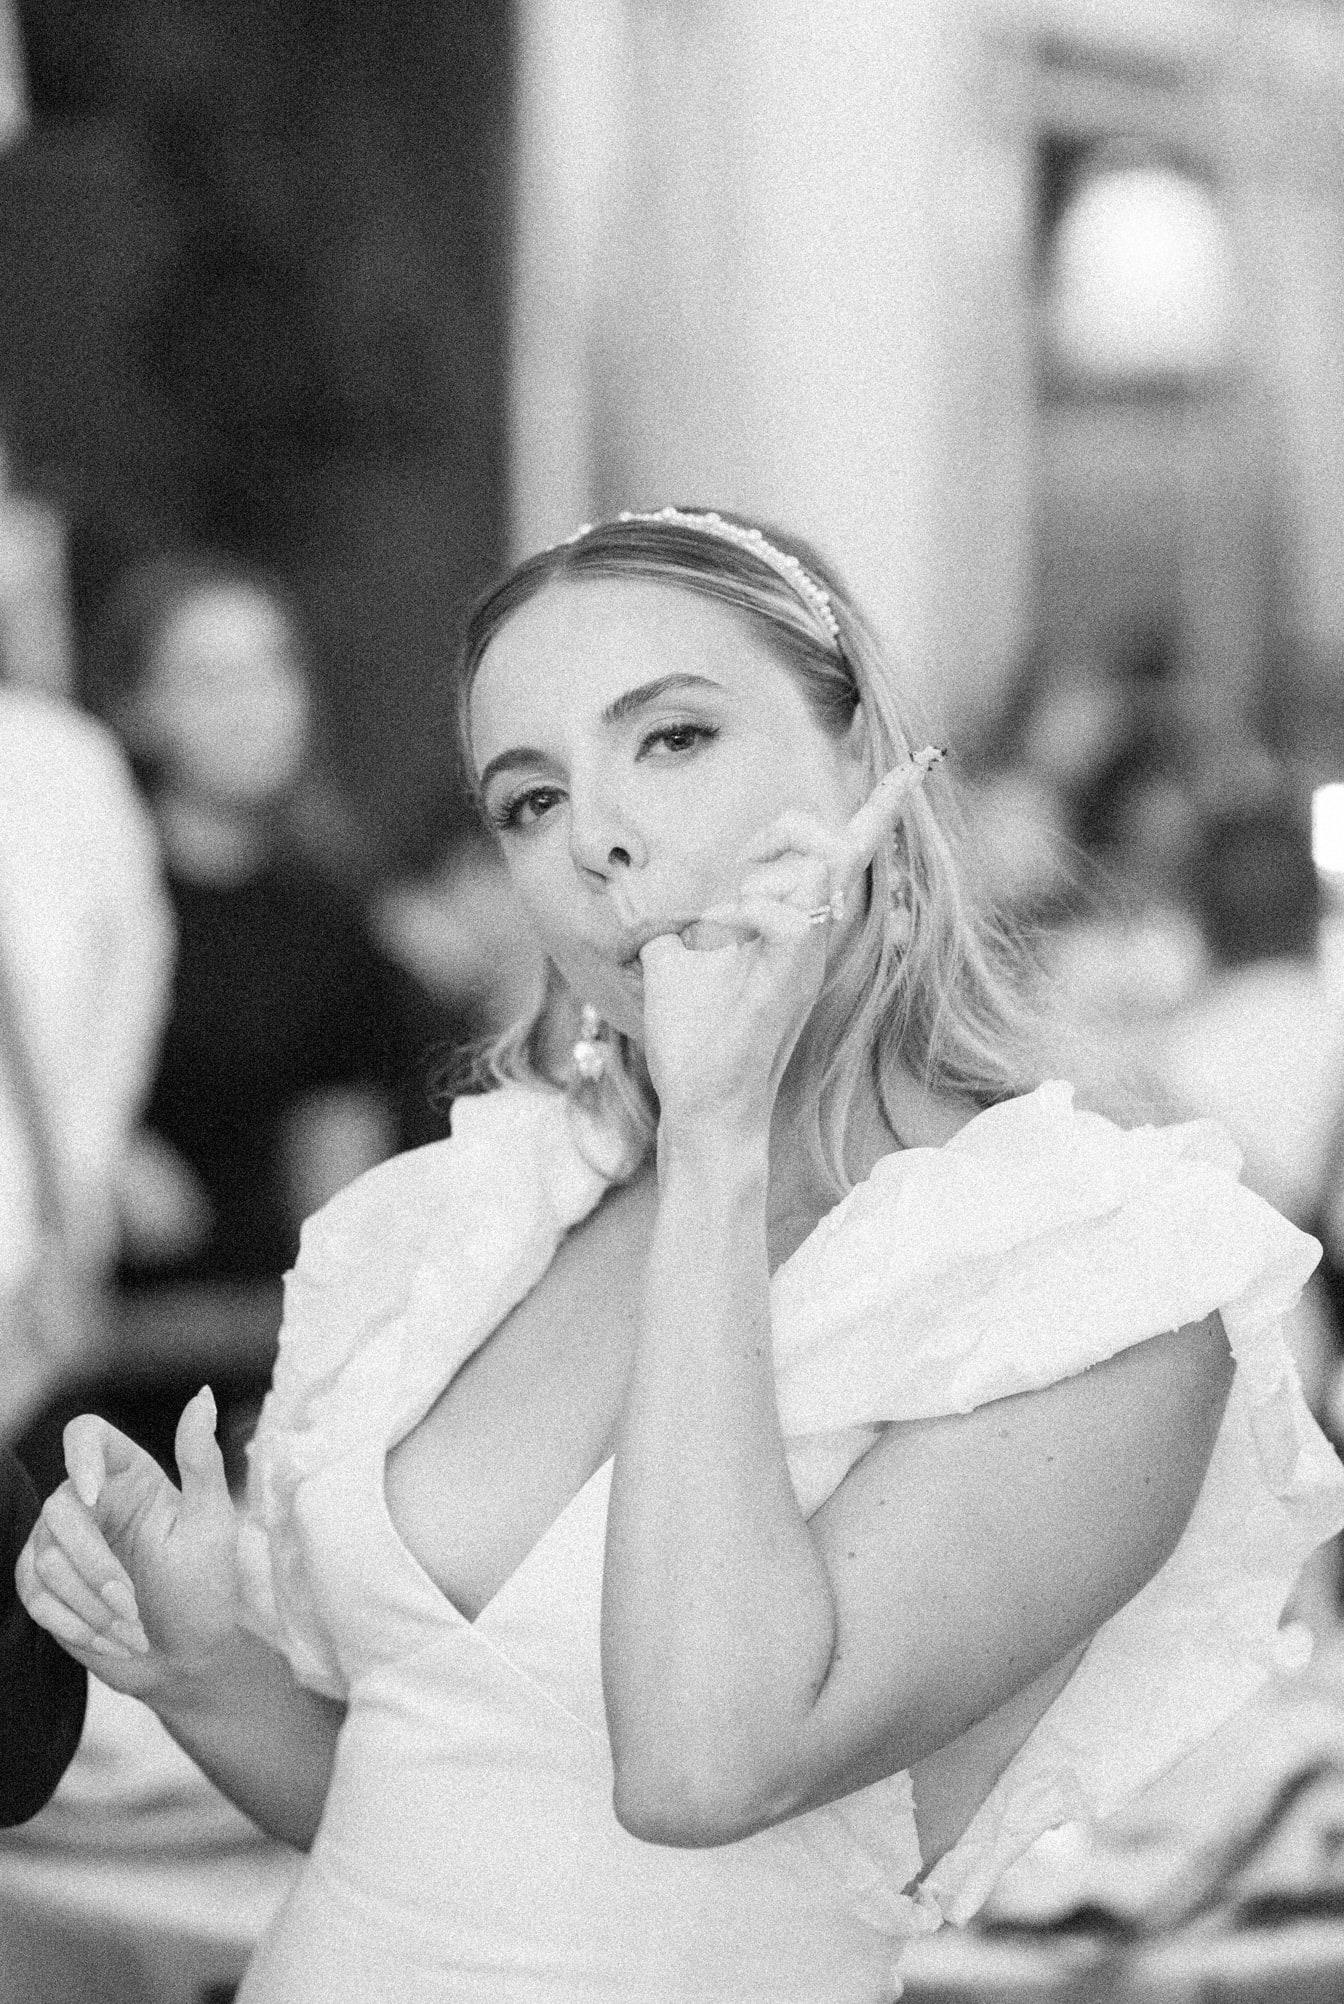 Bride eating her wedding cake